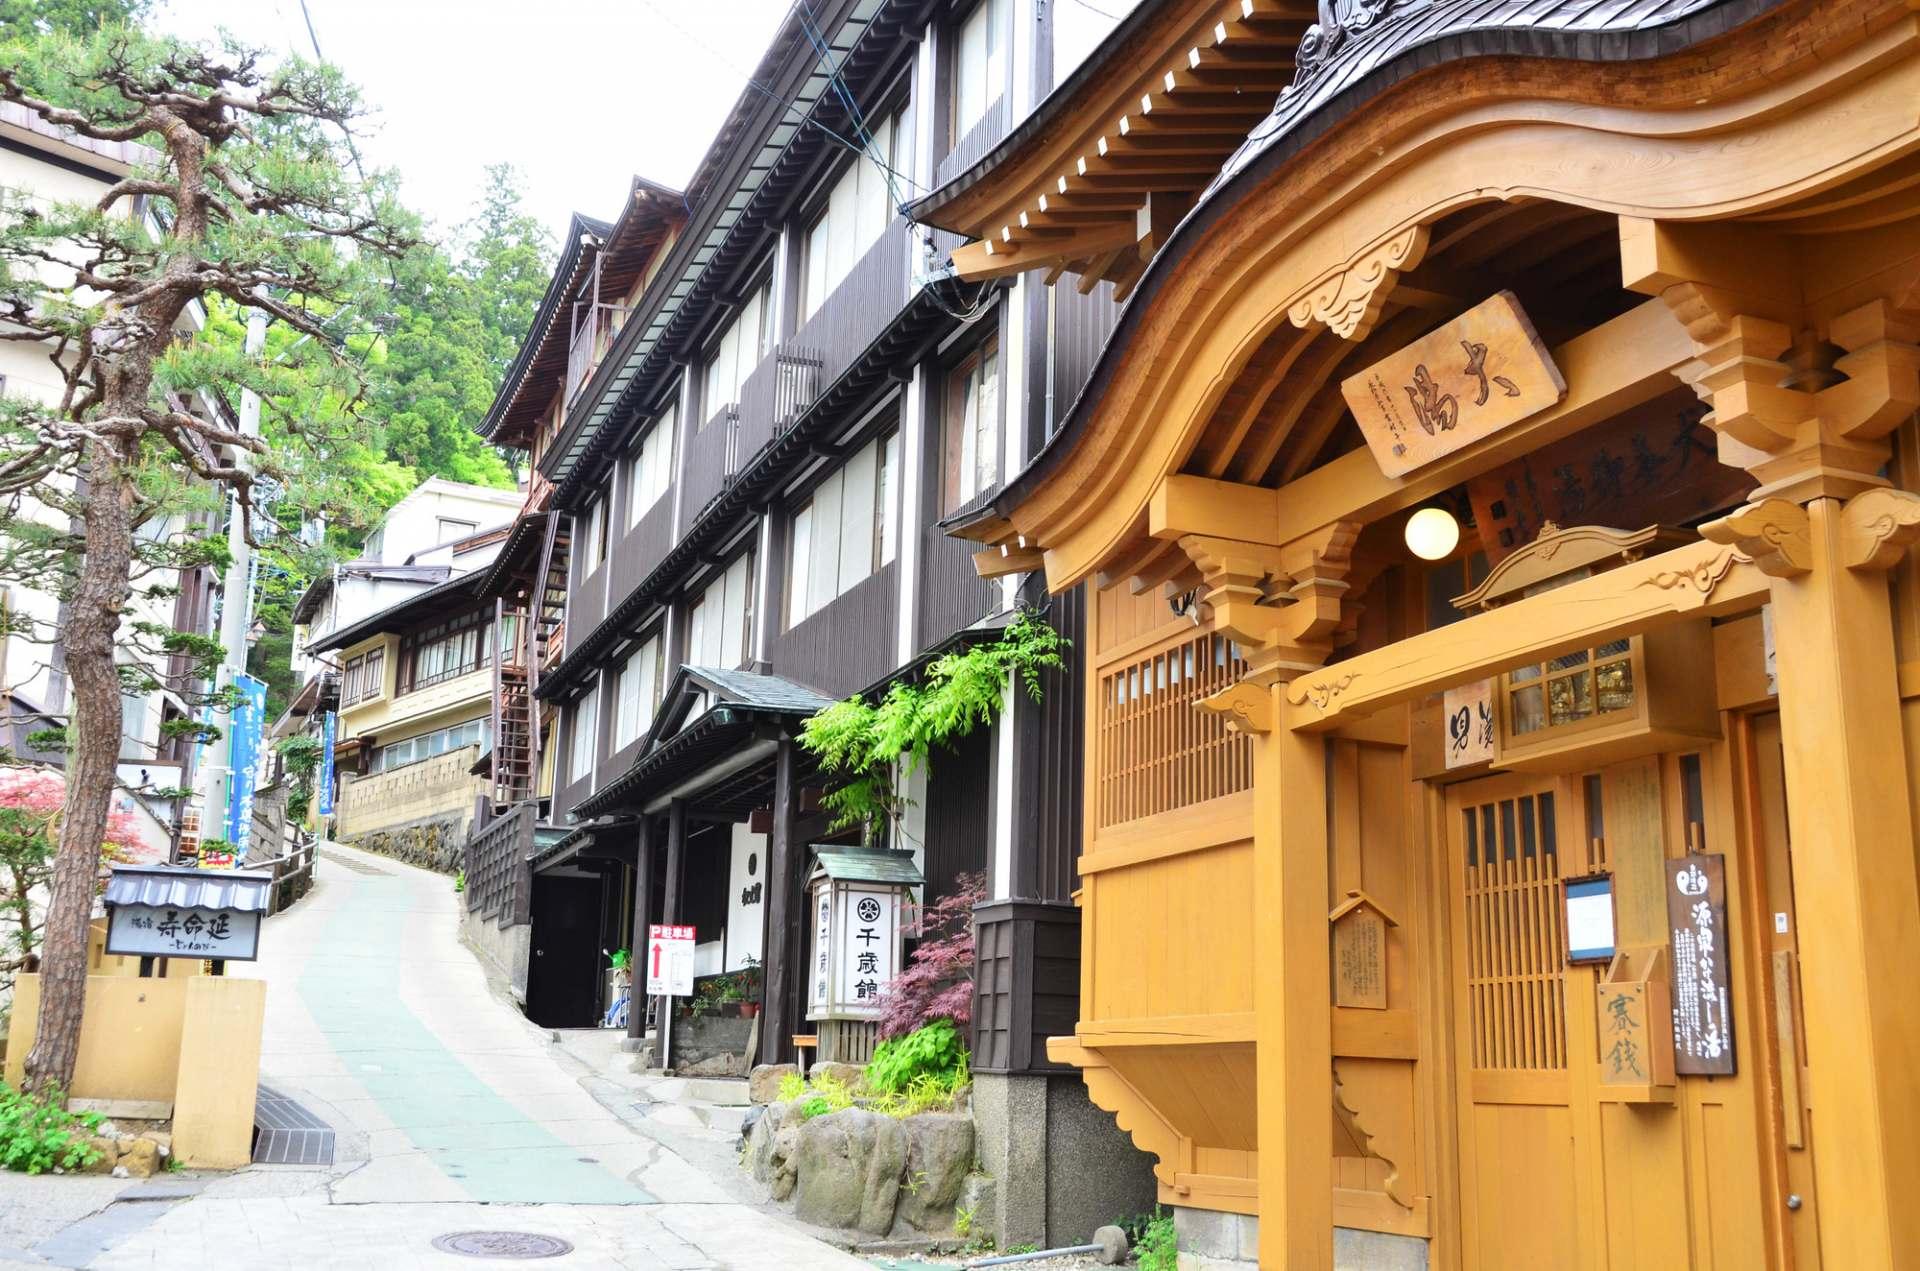 A Row of Inns in Nozawa Onsen Town